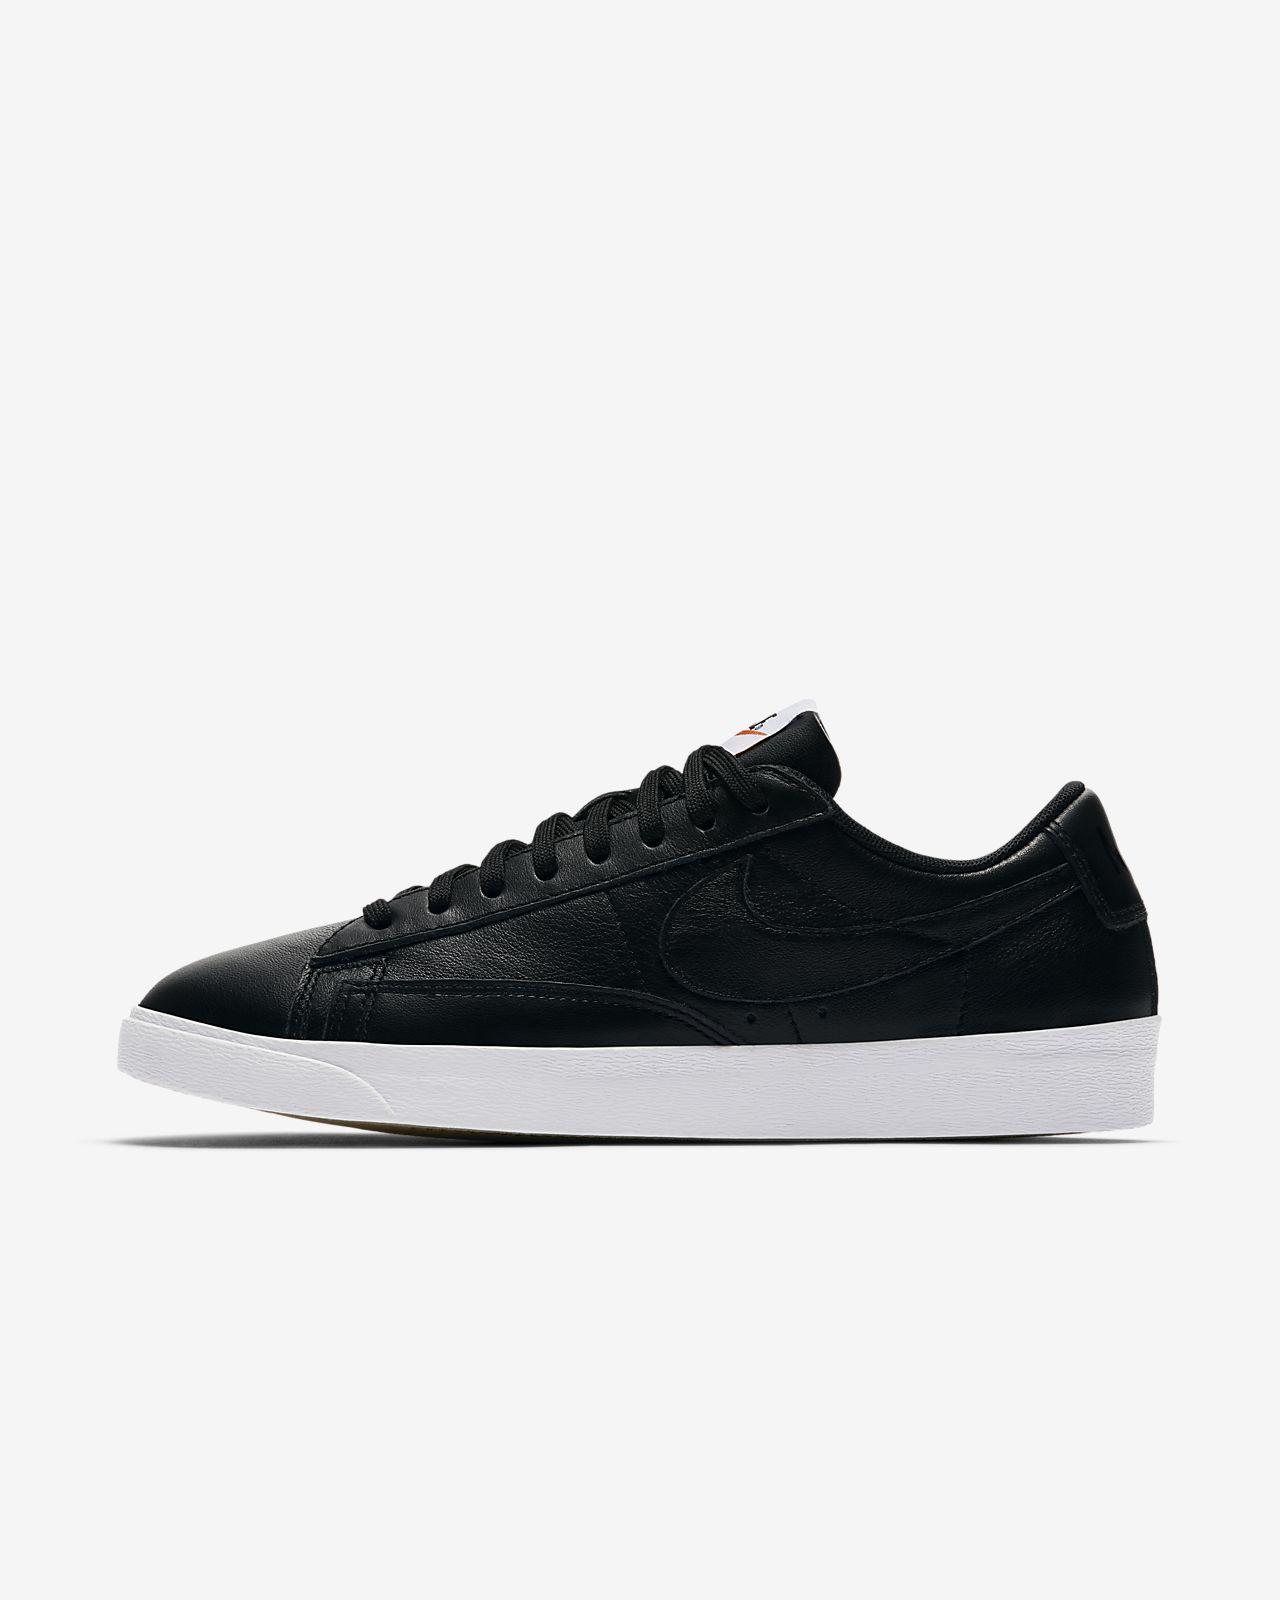 Nike Sneakers Stupende Ed. Limitata 38 Spina Di Pesce